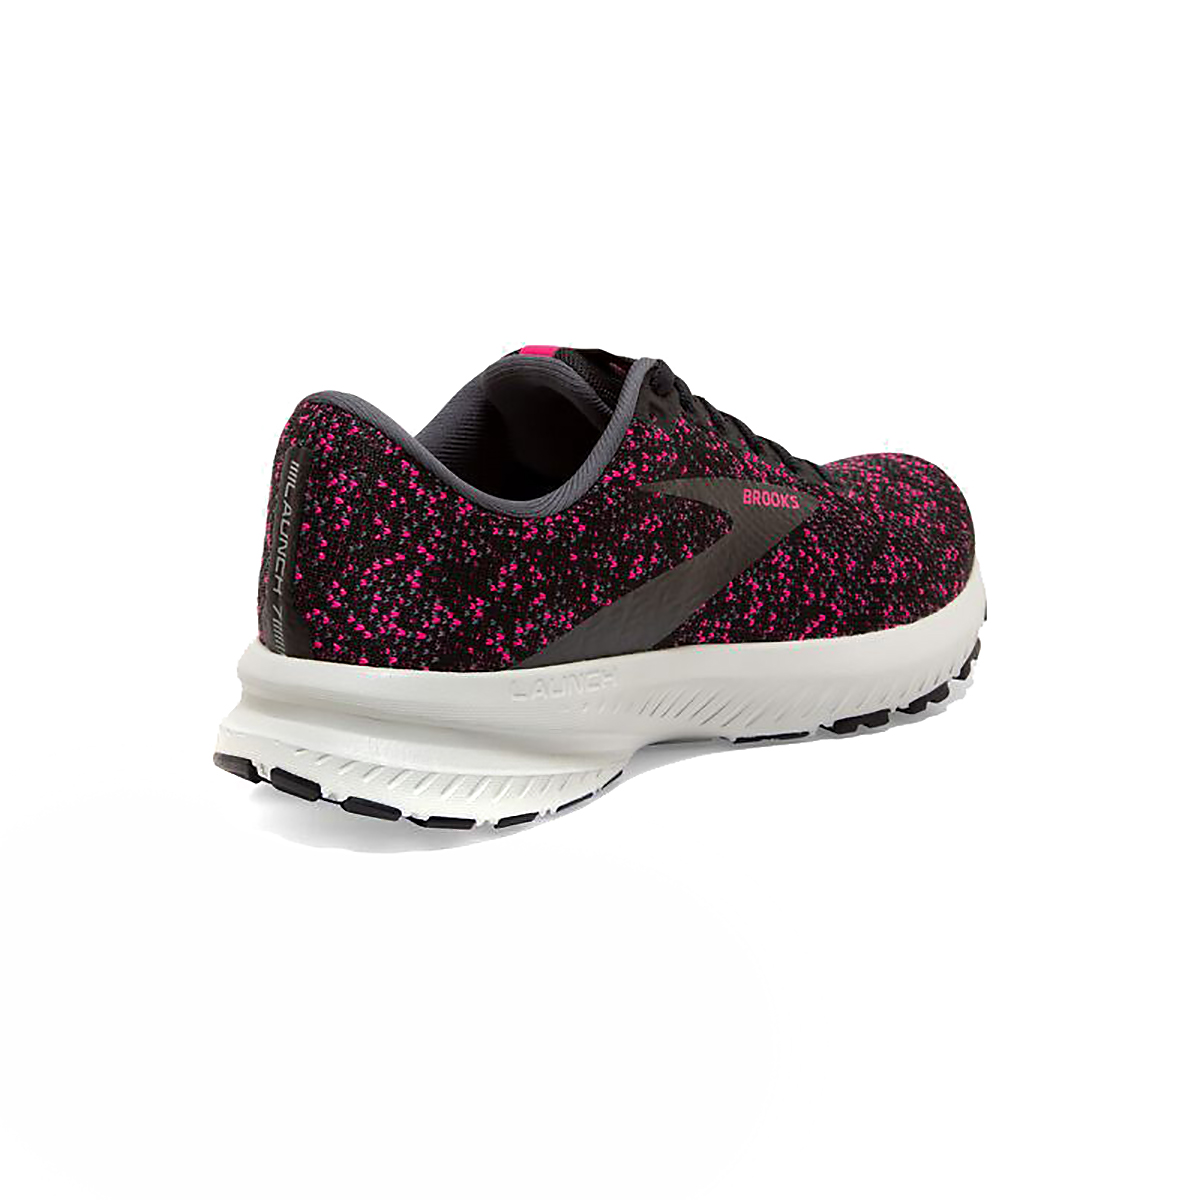 Women's Brooks Launch 7 Running Shoe - Color: Black/Ebony/Beetroot - Size: 5 - Width: Regular, Black/Ebony/Beetroot, large, image 4